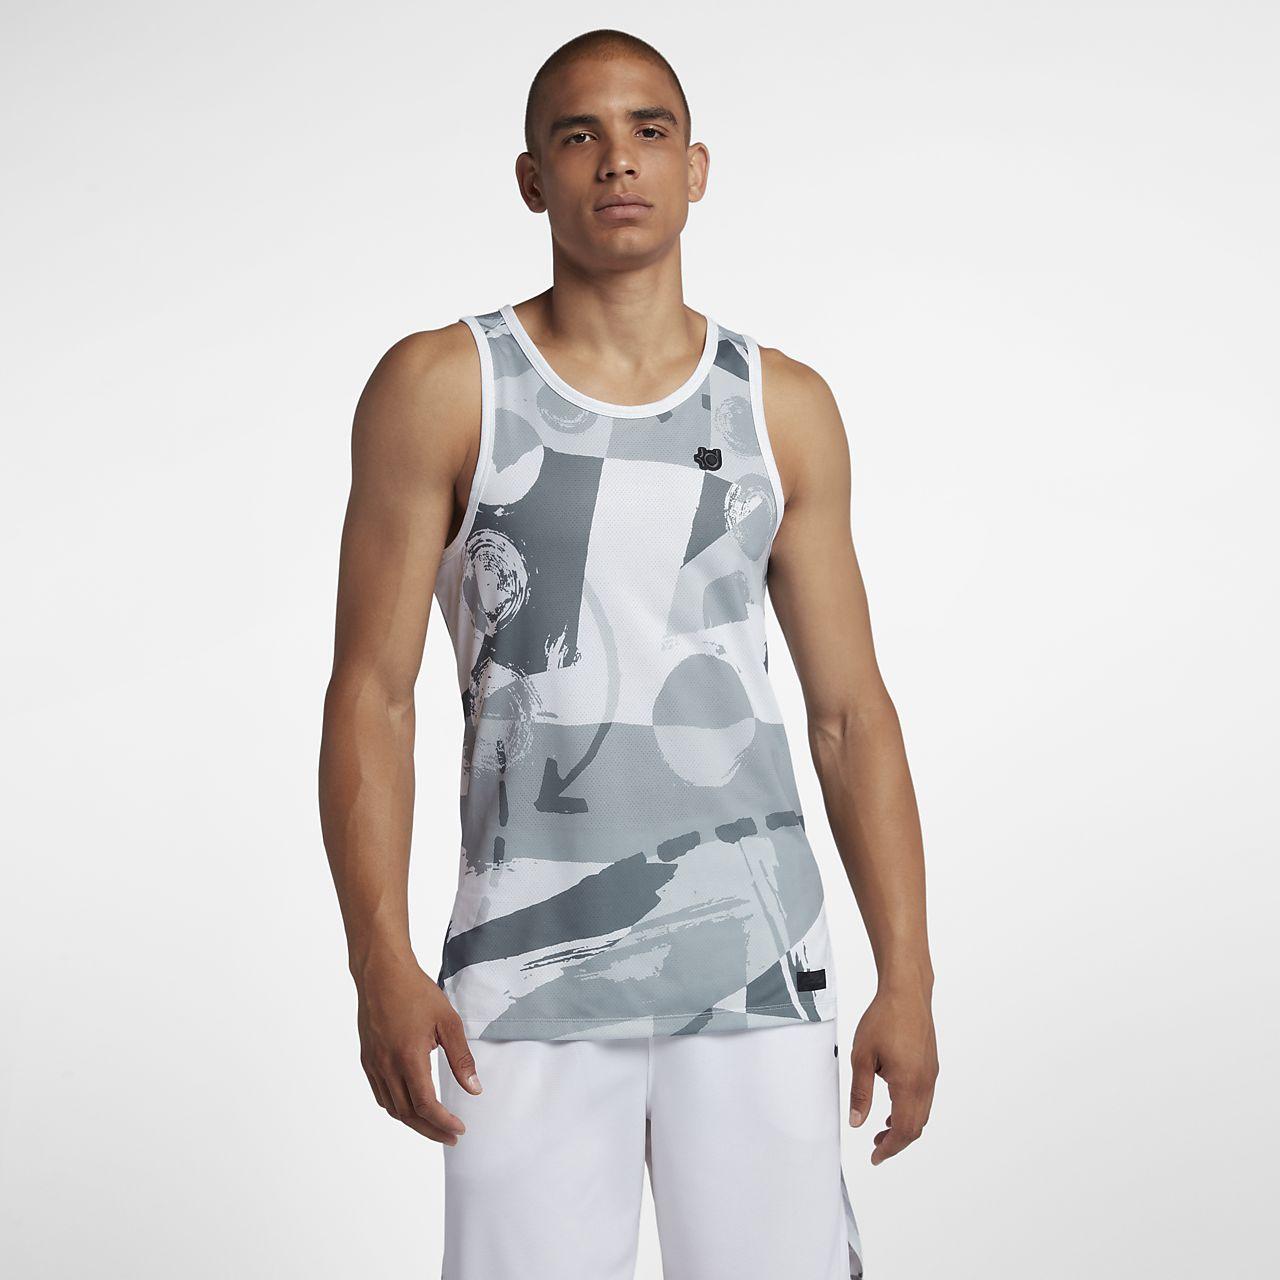 Nike KD Hyper Elite Erkek Basketbol Atleti